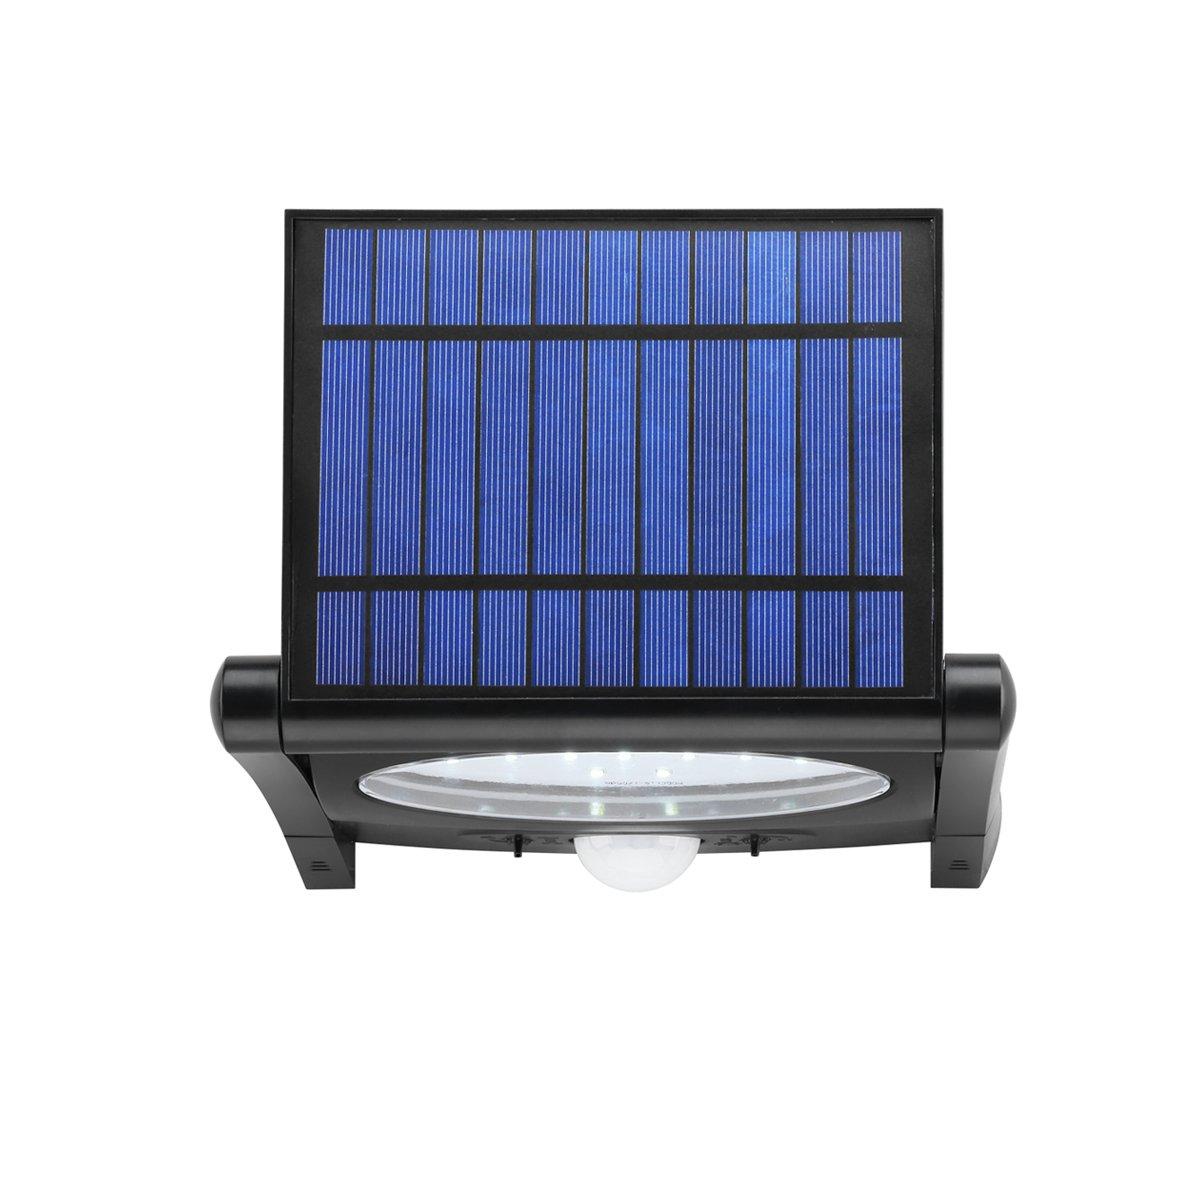 Link2Home EM-SL360B Outdoor LED 320 Lumen Solar Security Adjustable Motion Sensor Light with Photocell Technology in Black by Link2Home